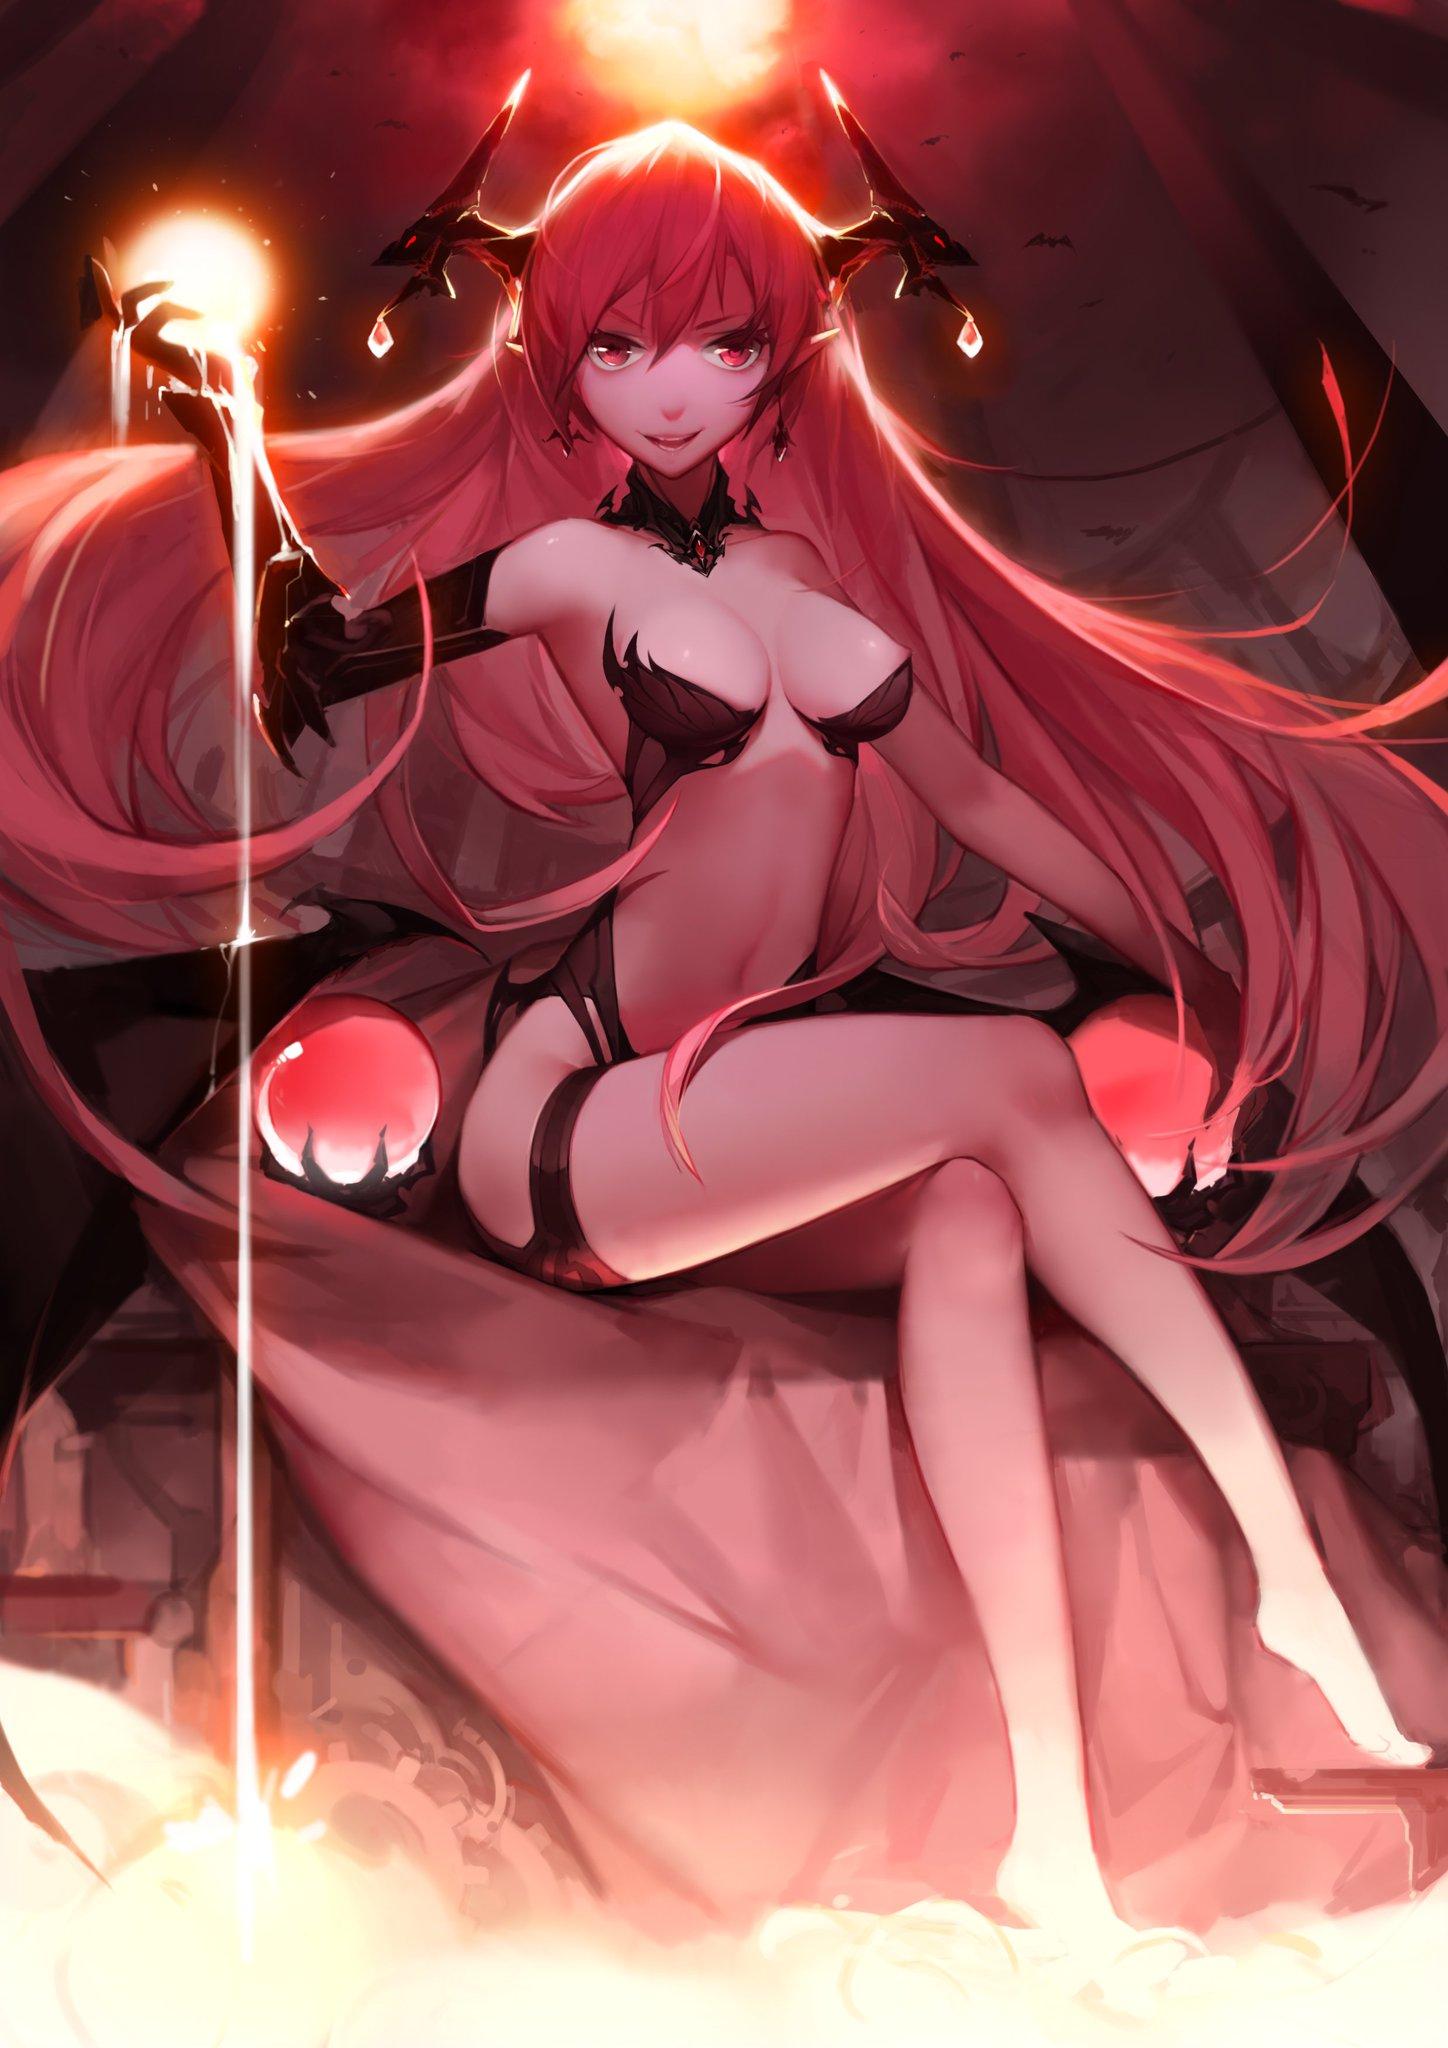 nude fantasy girl japan